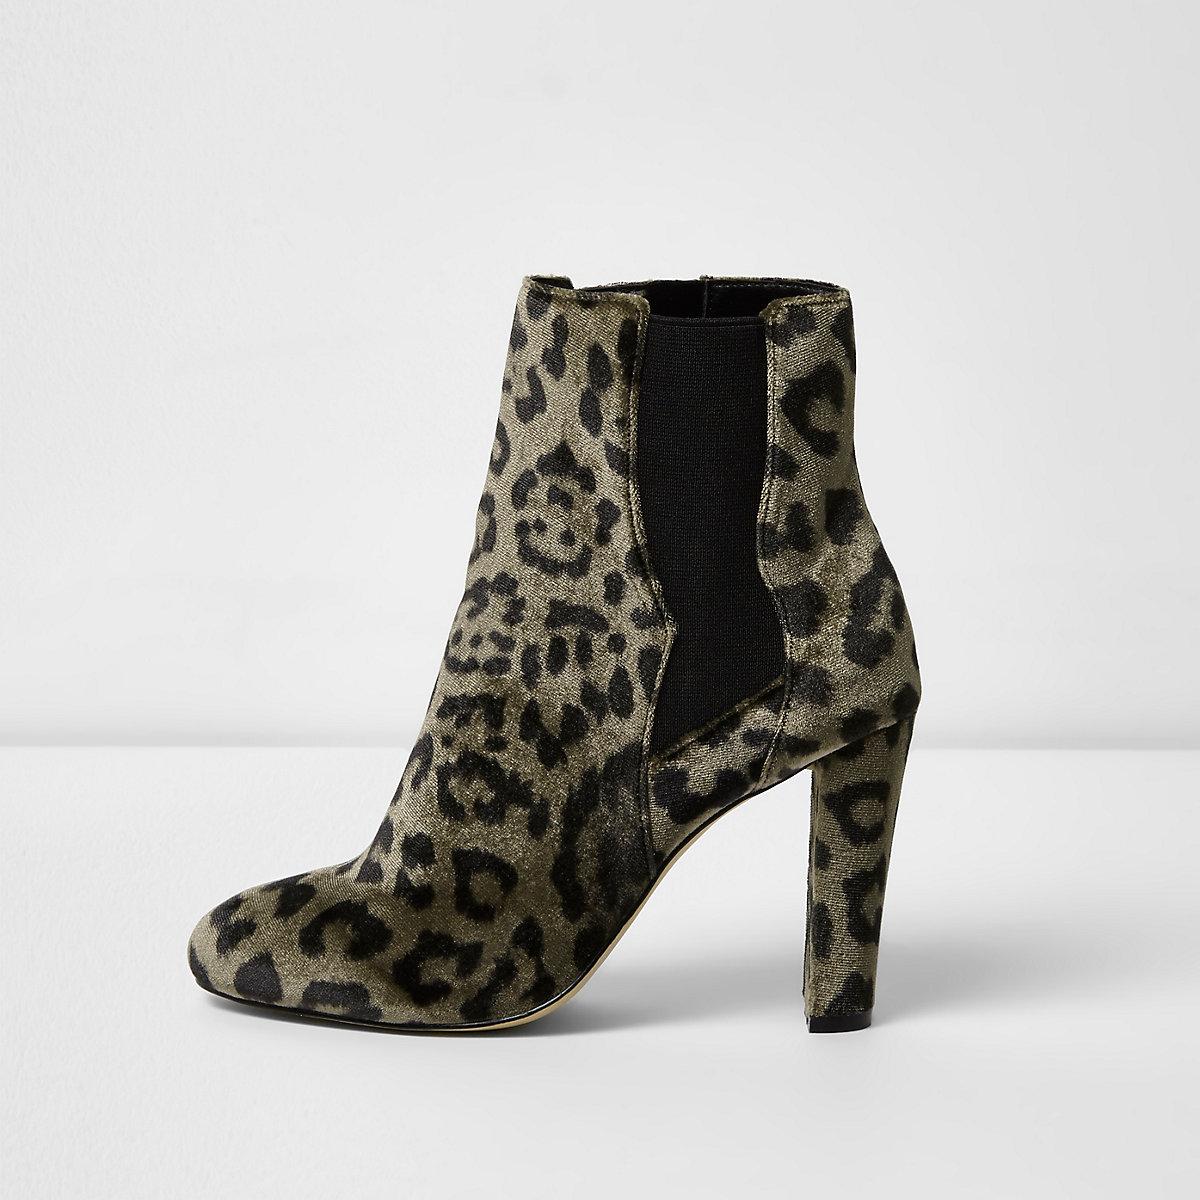 Kakigroen chelsea boots met luidpaardprint